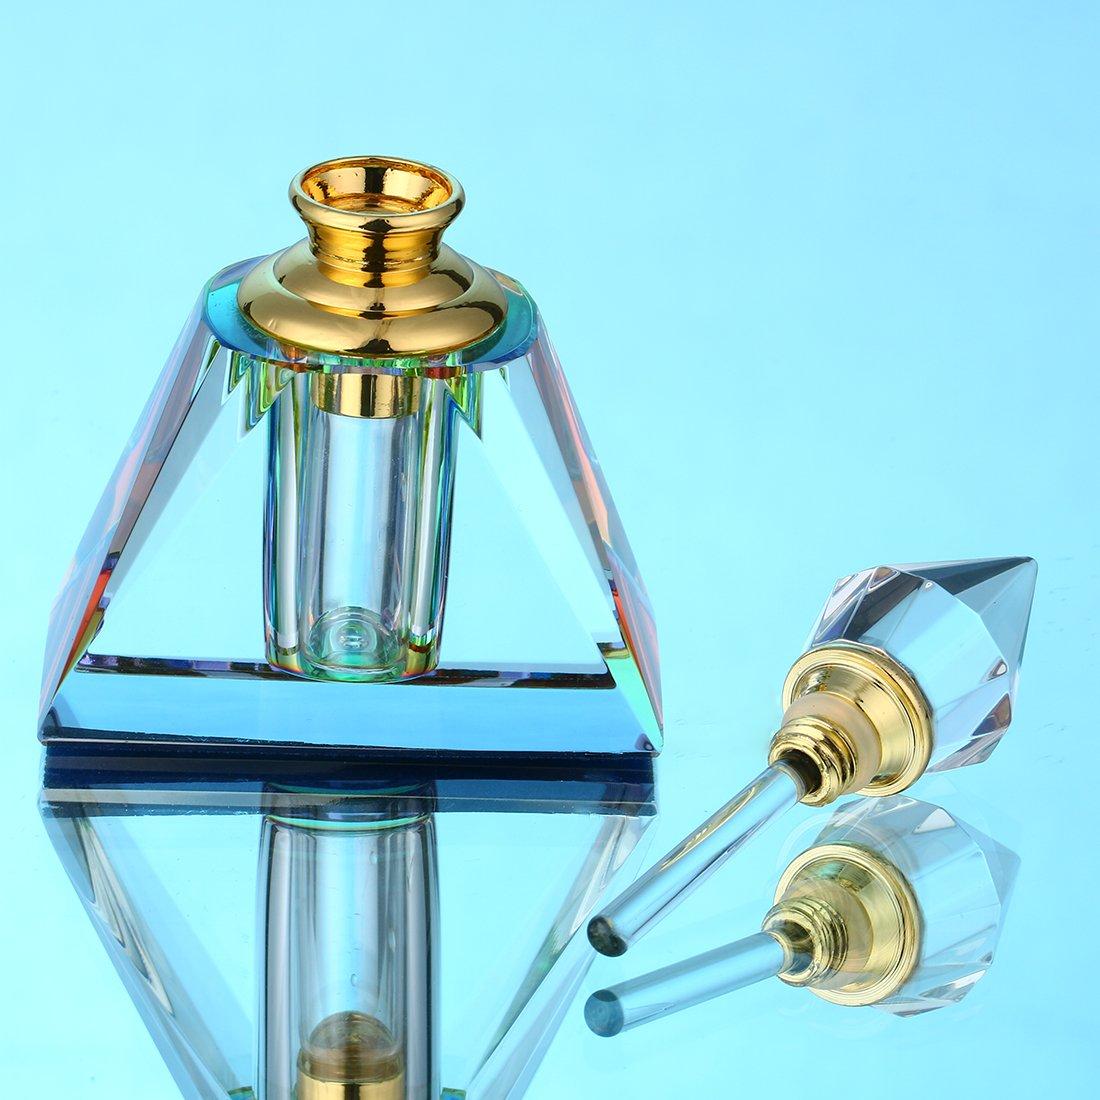 H&D Vintage Egyptian Perfume bottle Decor Refillable Mini Empty Potions Glass 3ML (Rectangular pyramid)